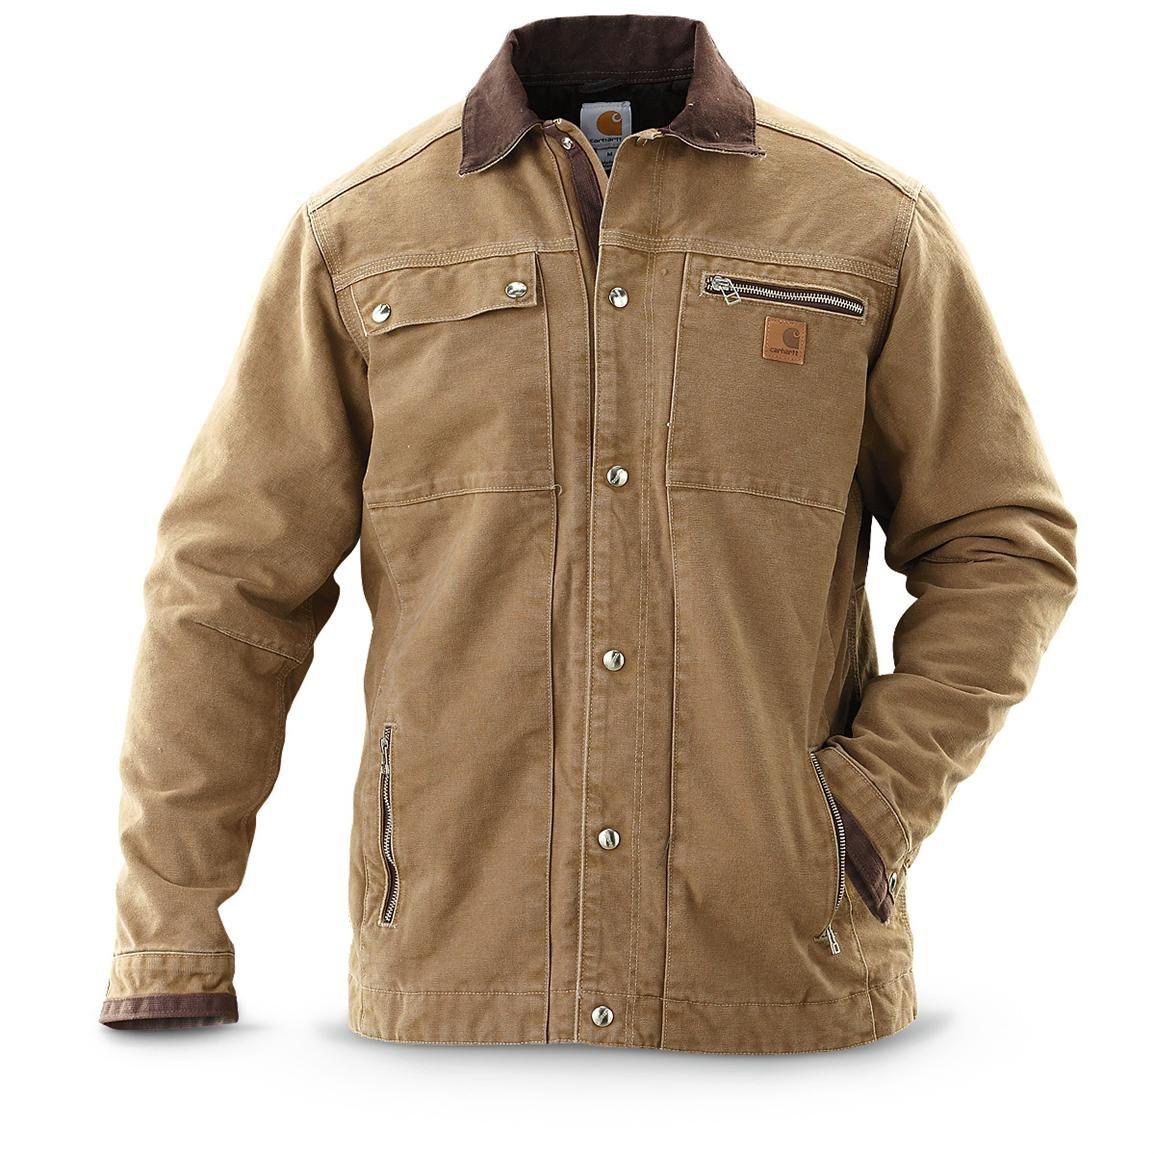 Carhartt Sandstone Multipocket Jacket A Warm Hardy Hauler Discount Priced Jackets Men Fashion Carhartt Workwear Jackets [ 1154 x 1154 Pixel ]